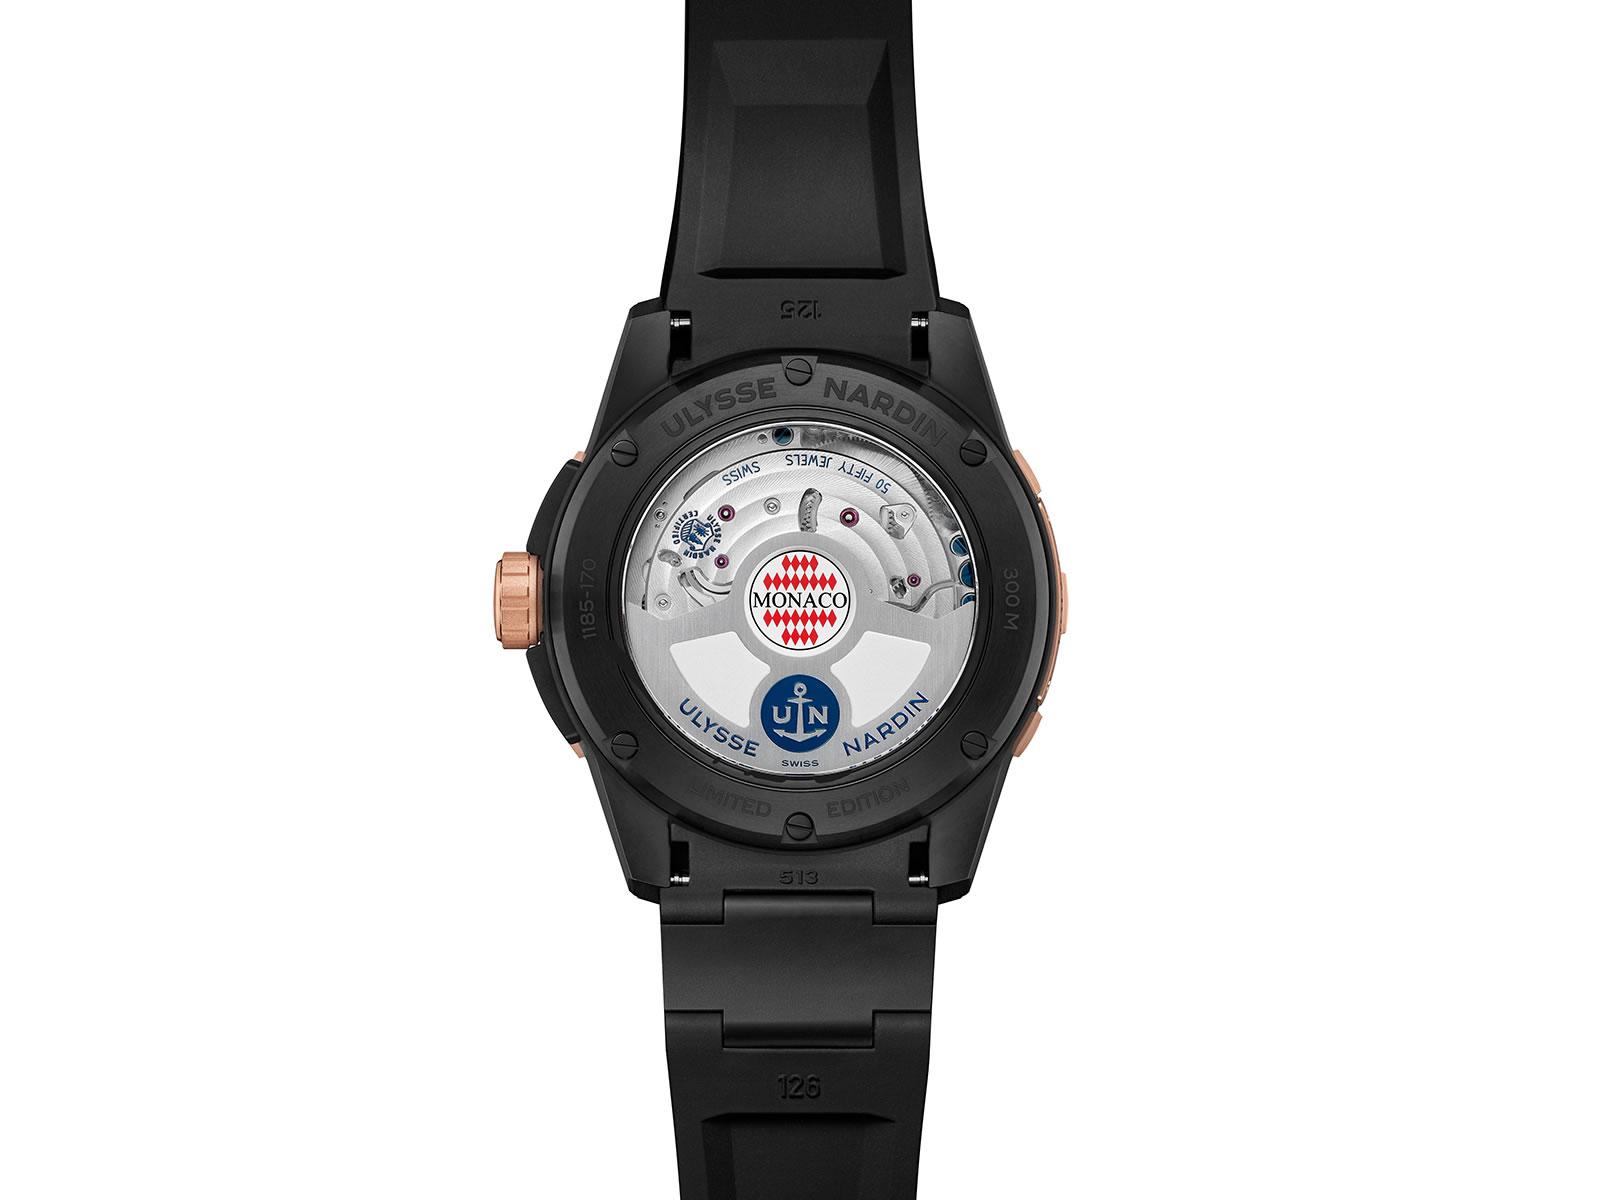 1185-170le-3-black-mon-ulysse-nardin-diver-chronometer-monaco-limited-edition-1.jpg